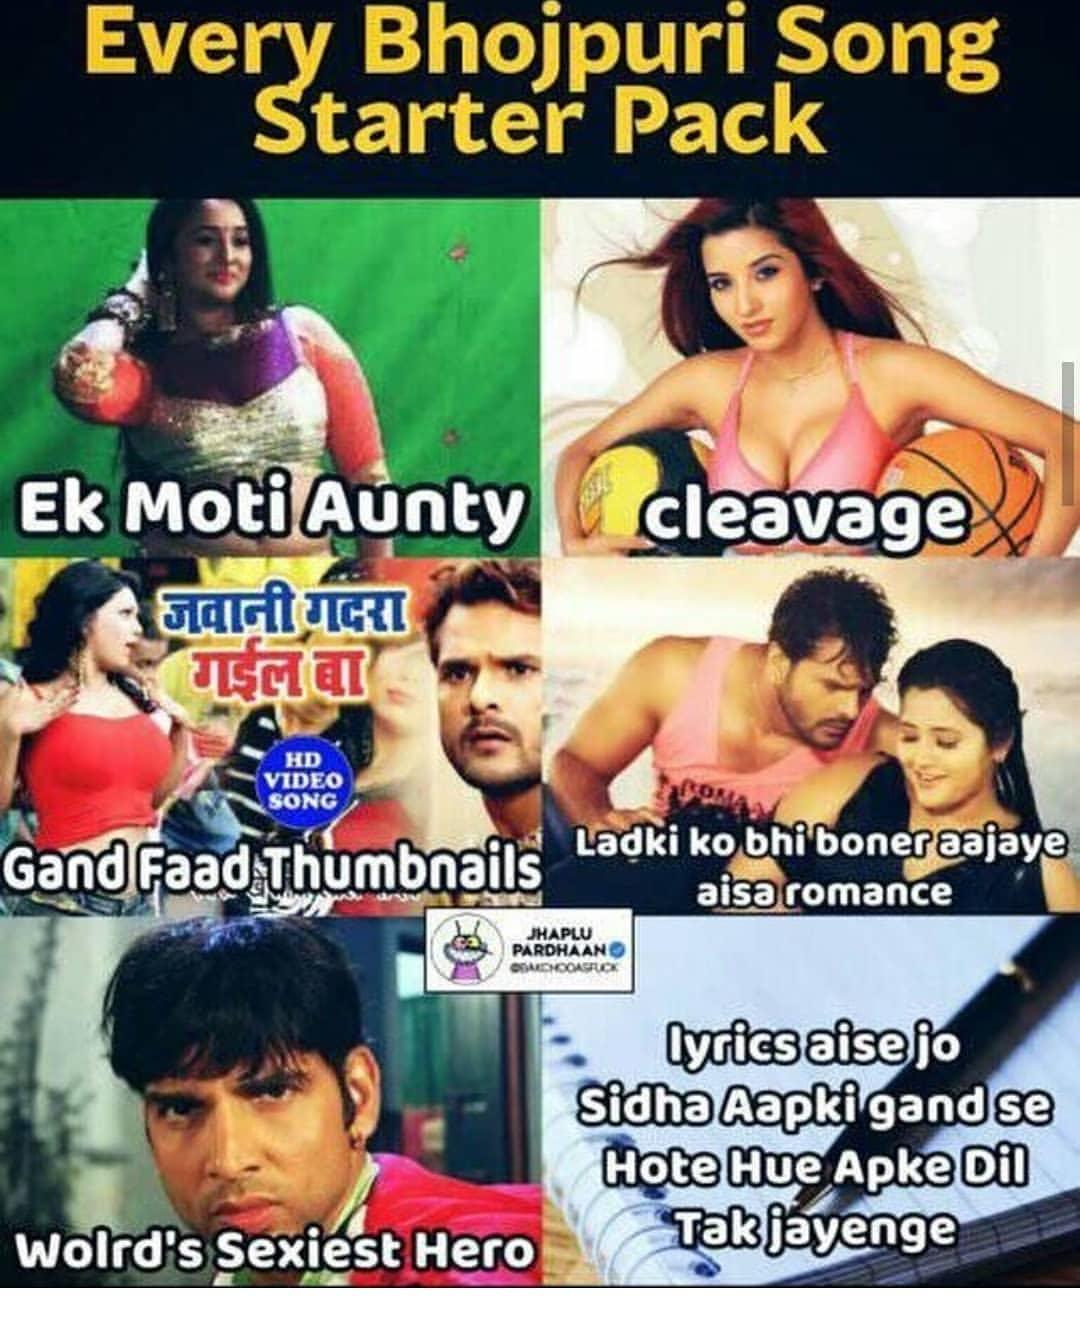 Every Bhojpuri Song Starter Pack Meme Hindi Memes At memesmonkey.com find thousands of memes categorized into thousands of categories. every bhojpuri song starter pack meme